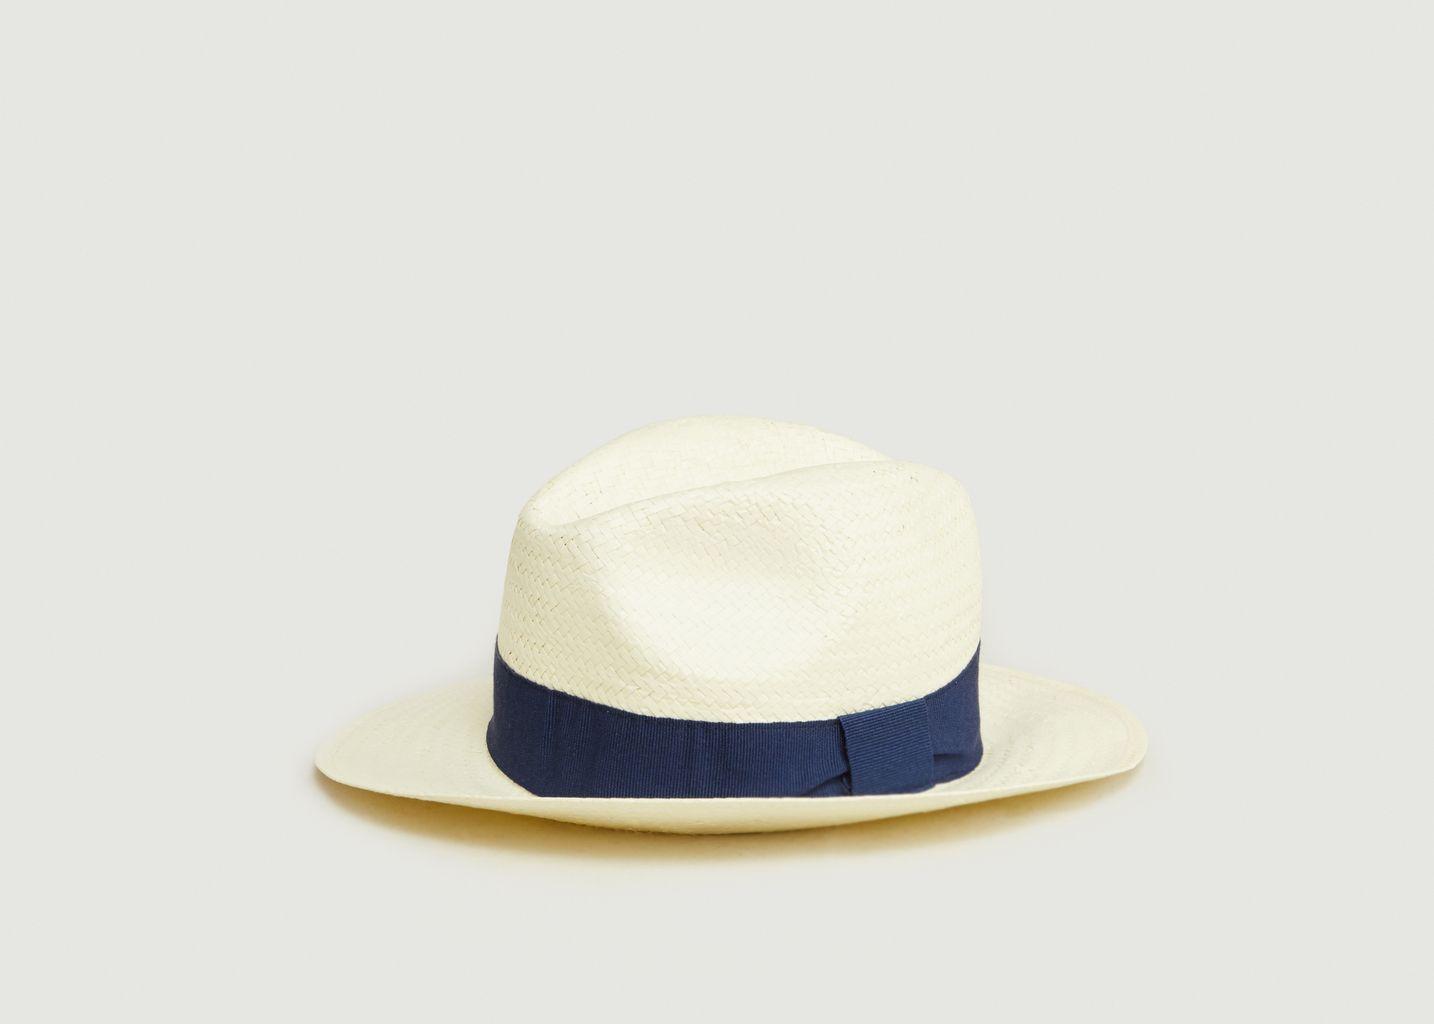 Chapeau Panama - 1789 Cala